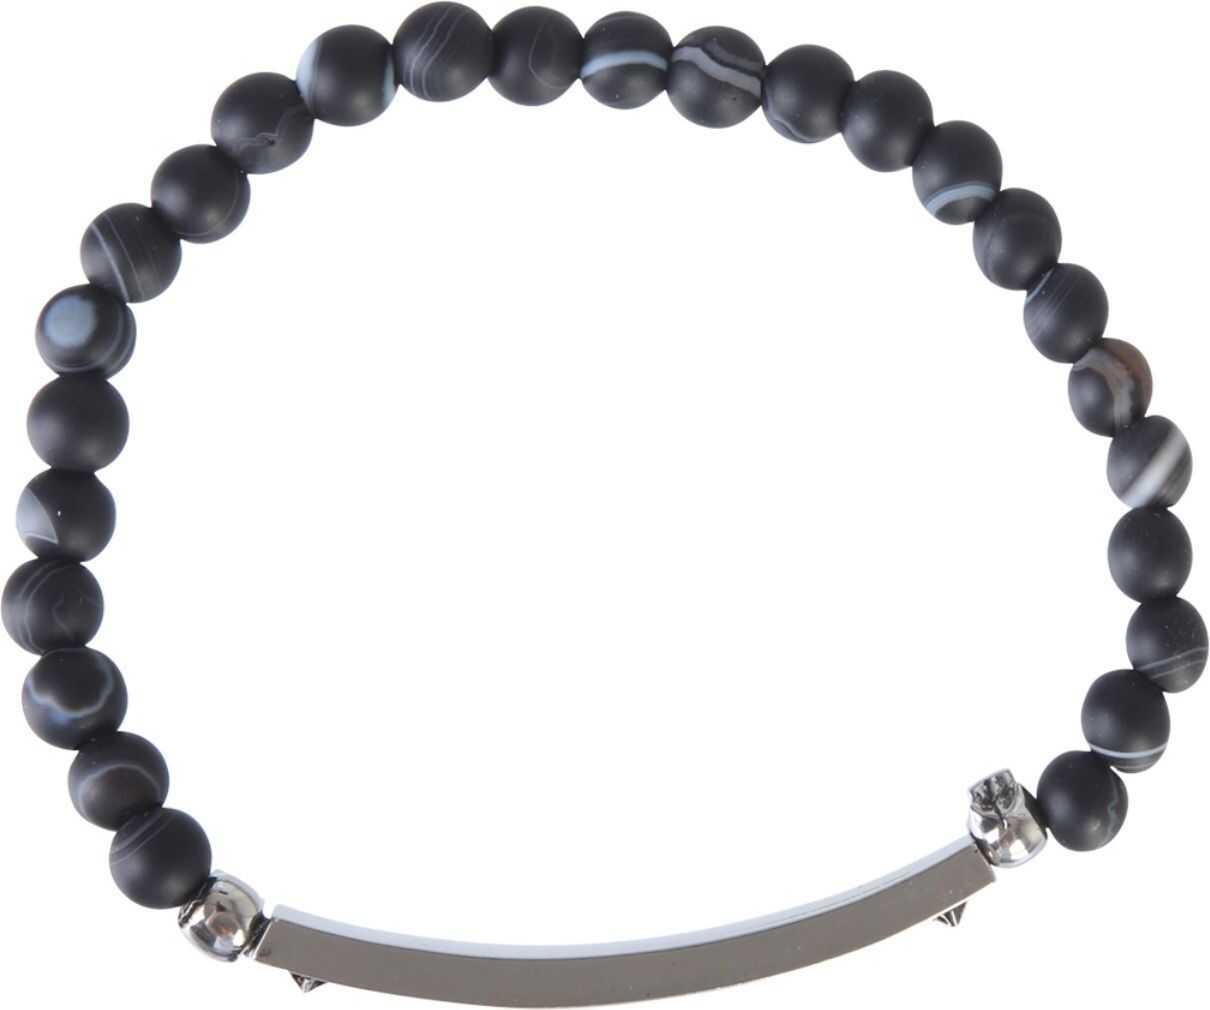 Alexander McQueen Identity Skull Bracelet BLACK